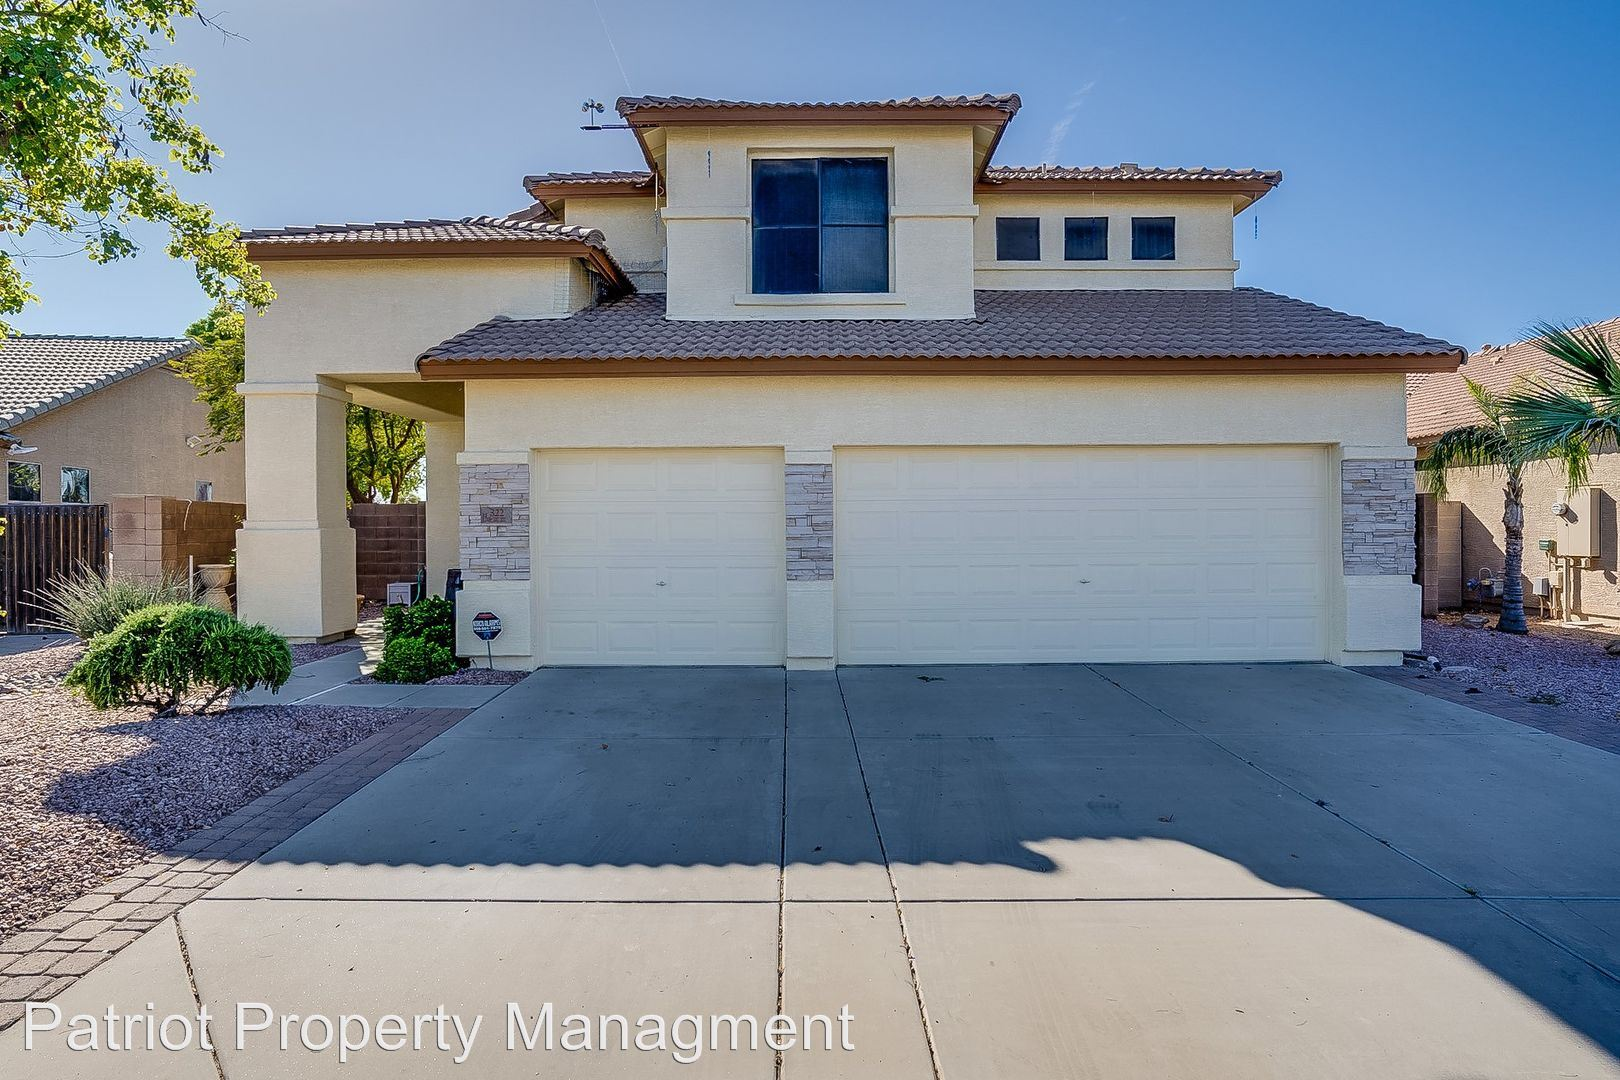 322 S 124th Ave, Avondale, AZ - $1,850